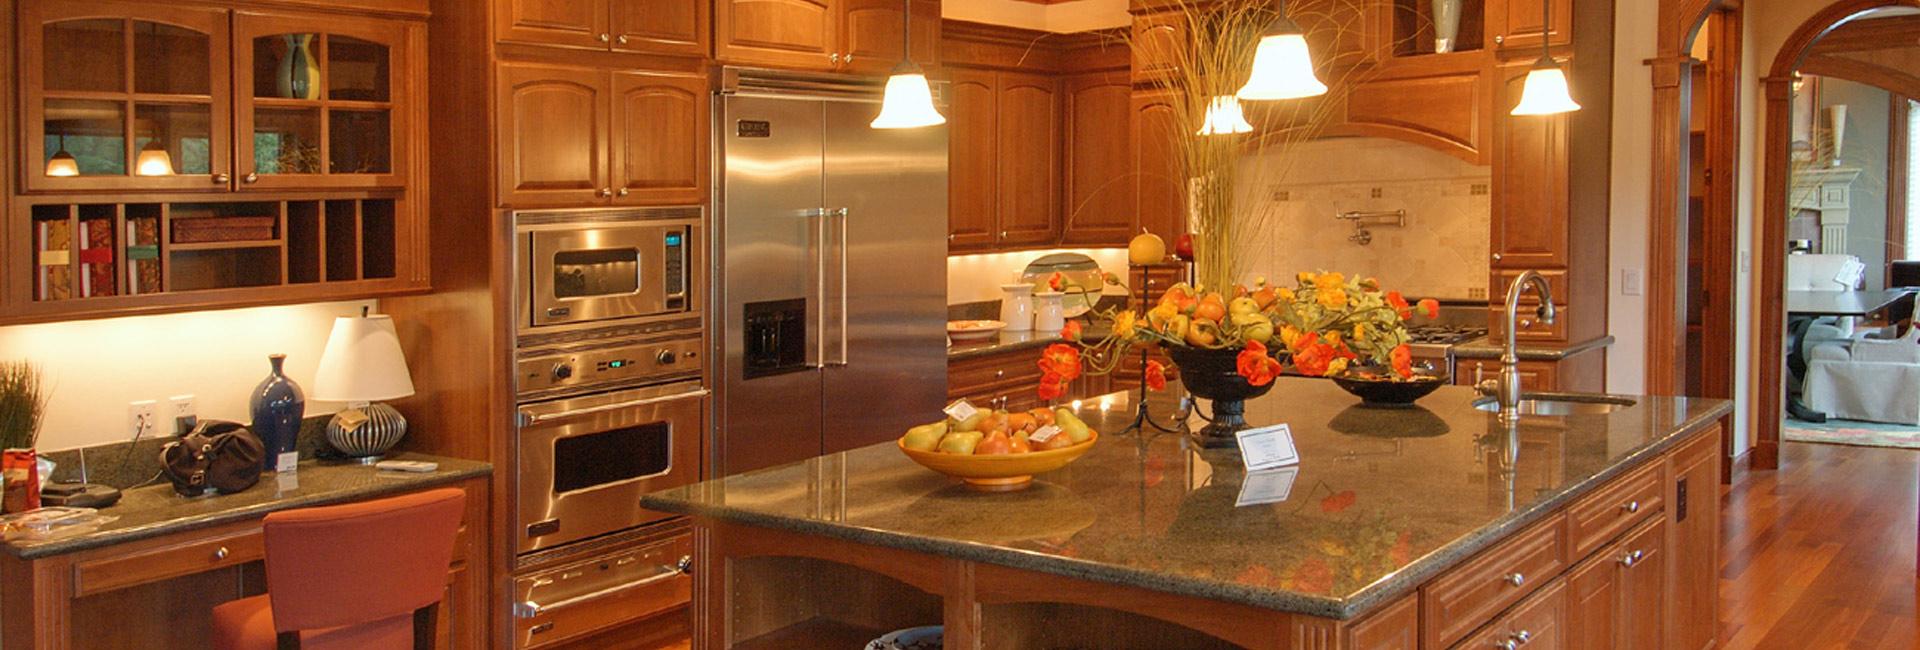 kitchen-remodeling-inland-empire-chino-hills